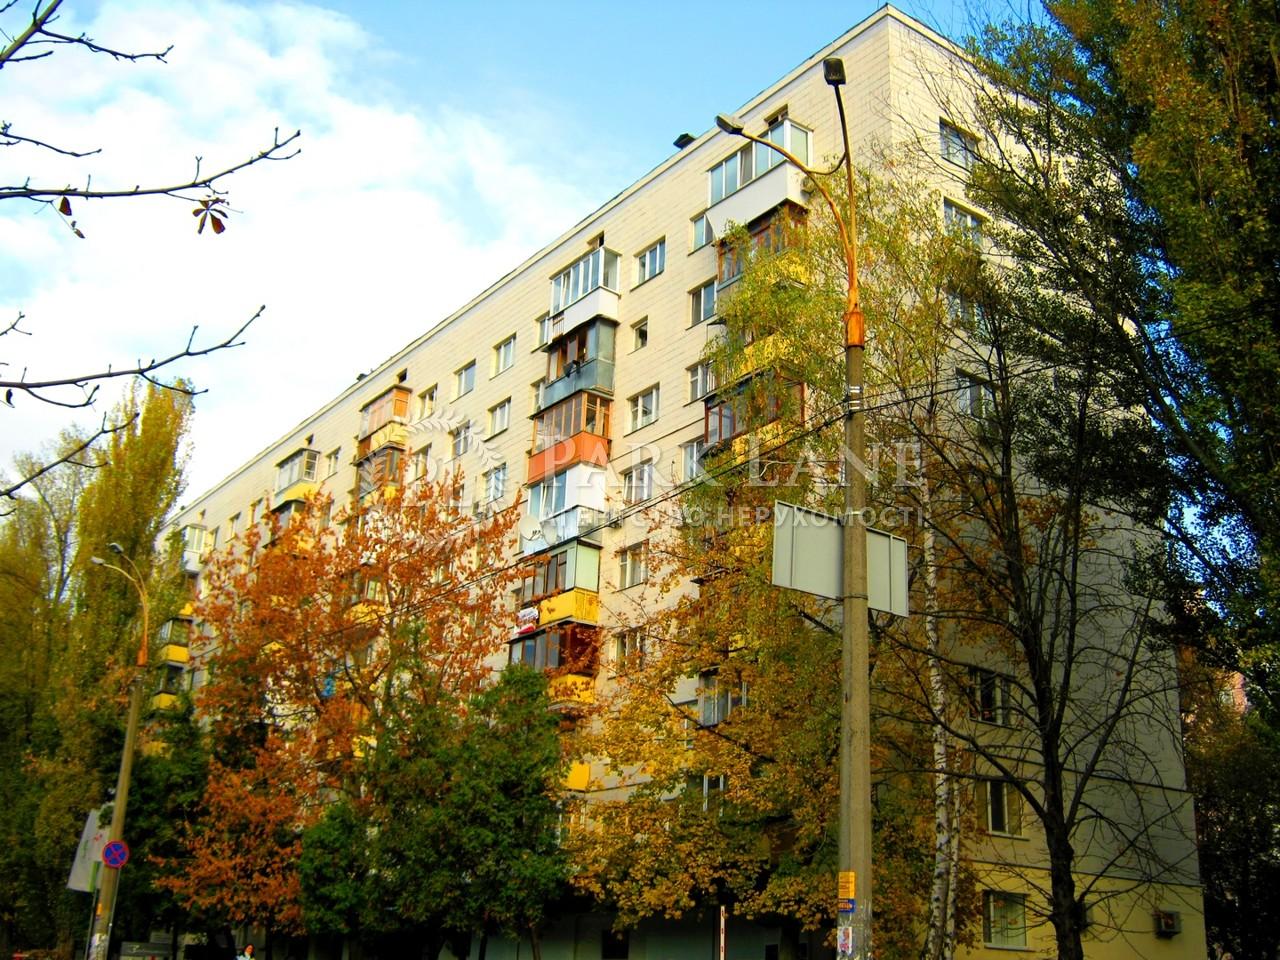 Квартира Новогоспитальная (Щорса пер.), 5, Киев, B-99247 - Фото 1